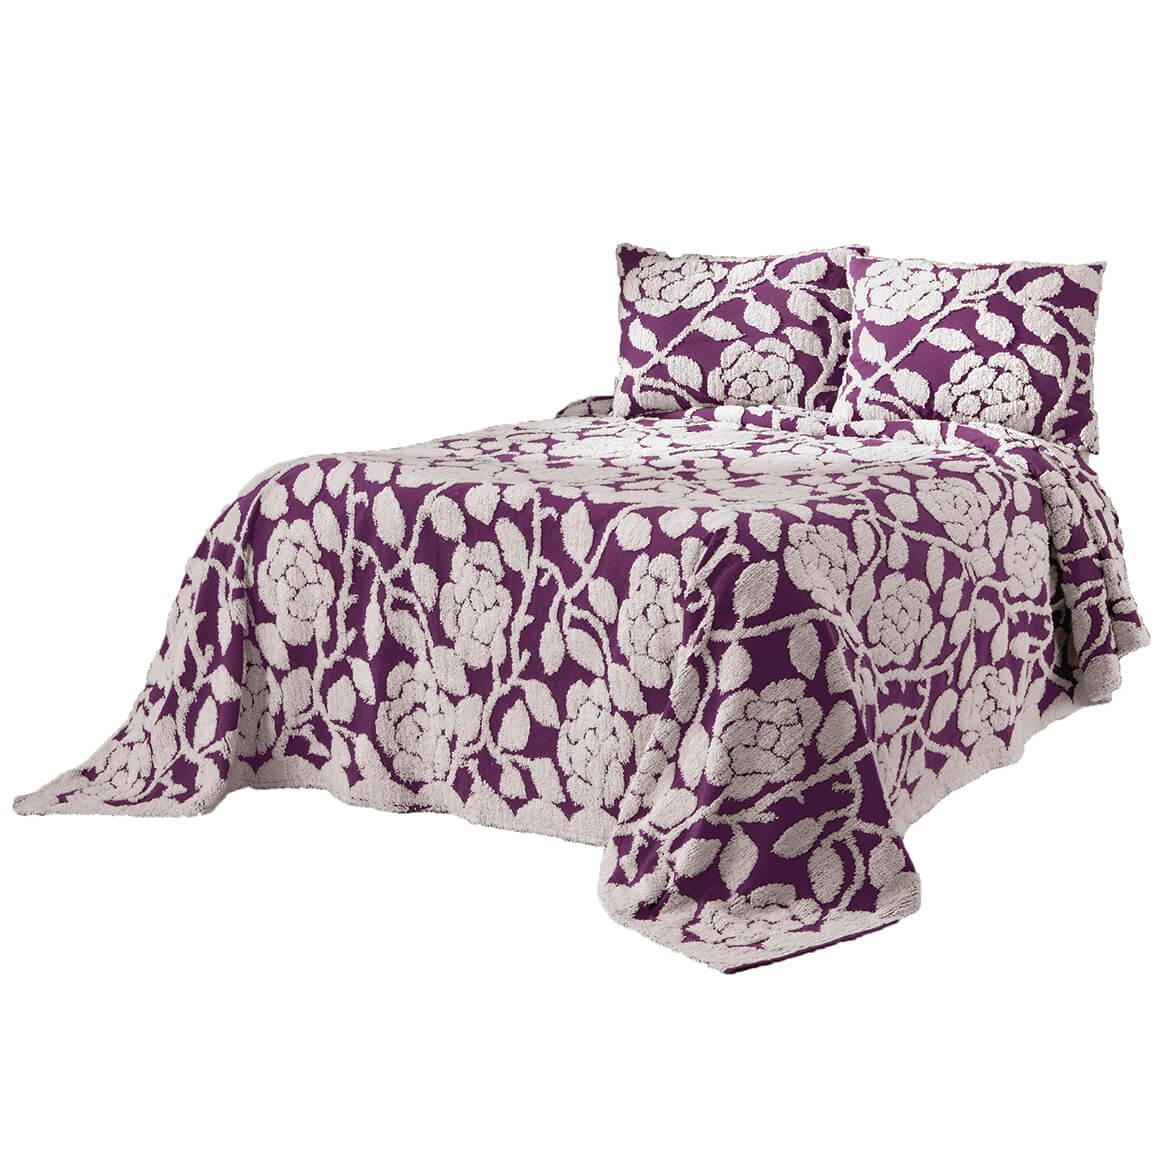 The-Grace-Chenille-Bedspread-by-OakRidgeTM thumbnail 28